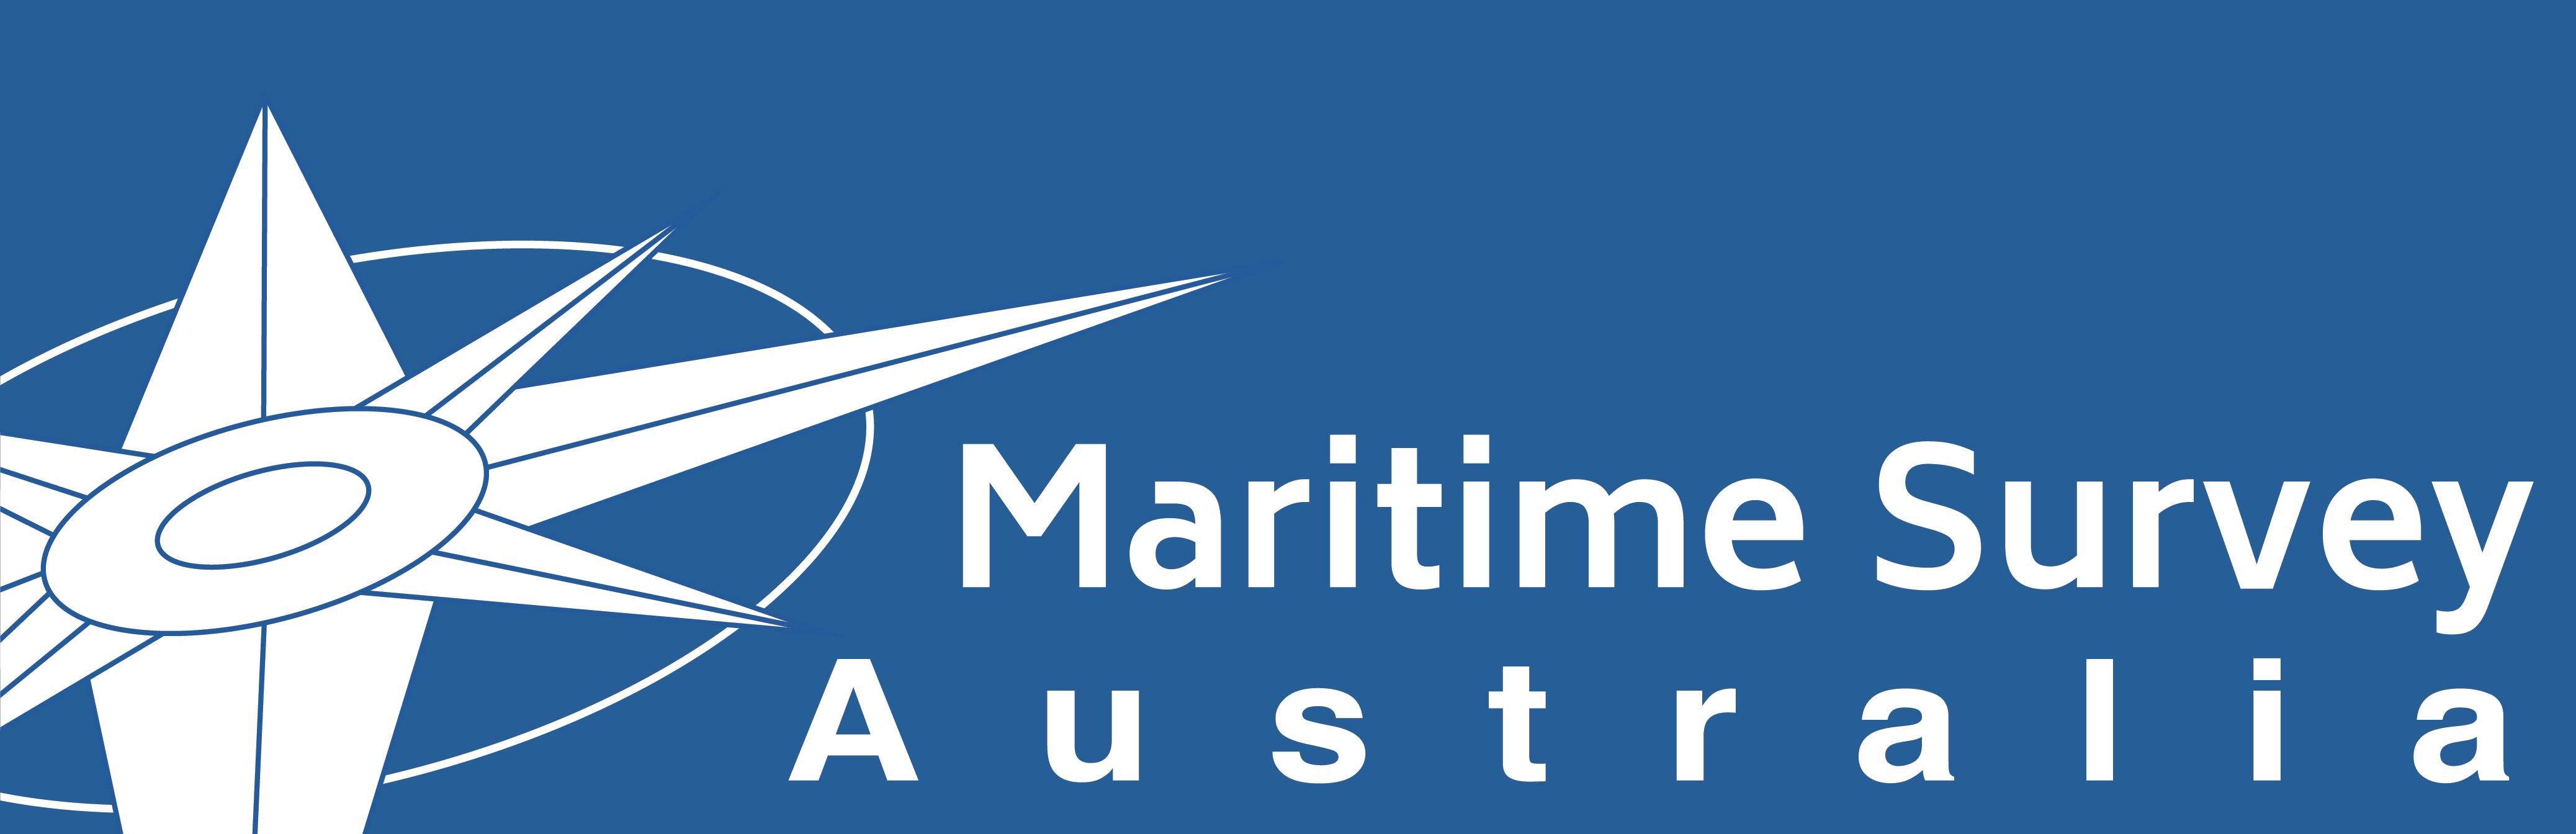 Maritime Survey Australia Logo